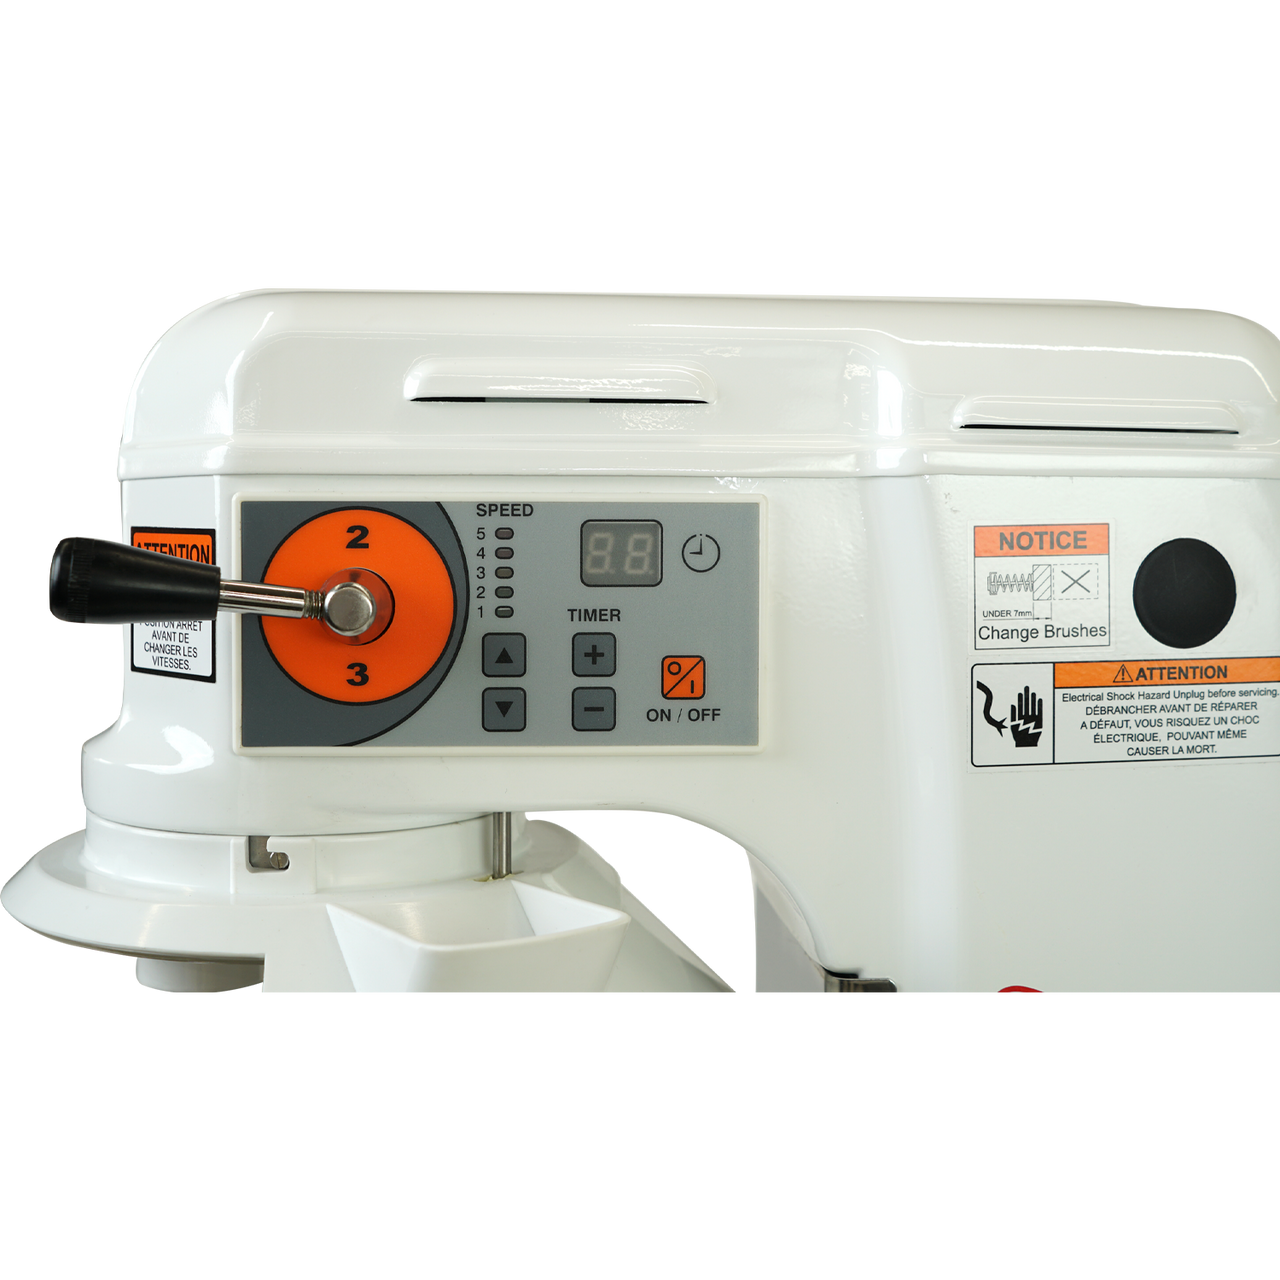 Control Panel, AE-10DCA 10 Quart Countertop Planetary Mixer, Commercial Mixer